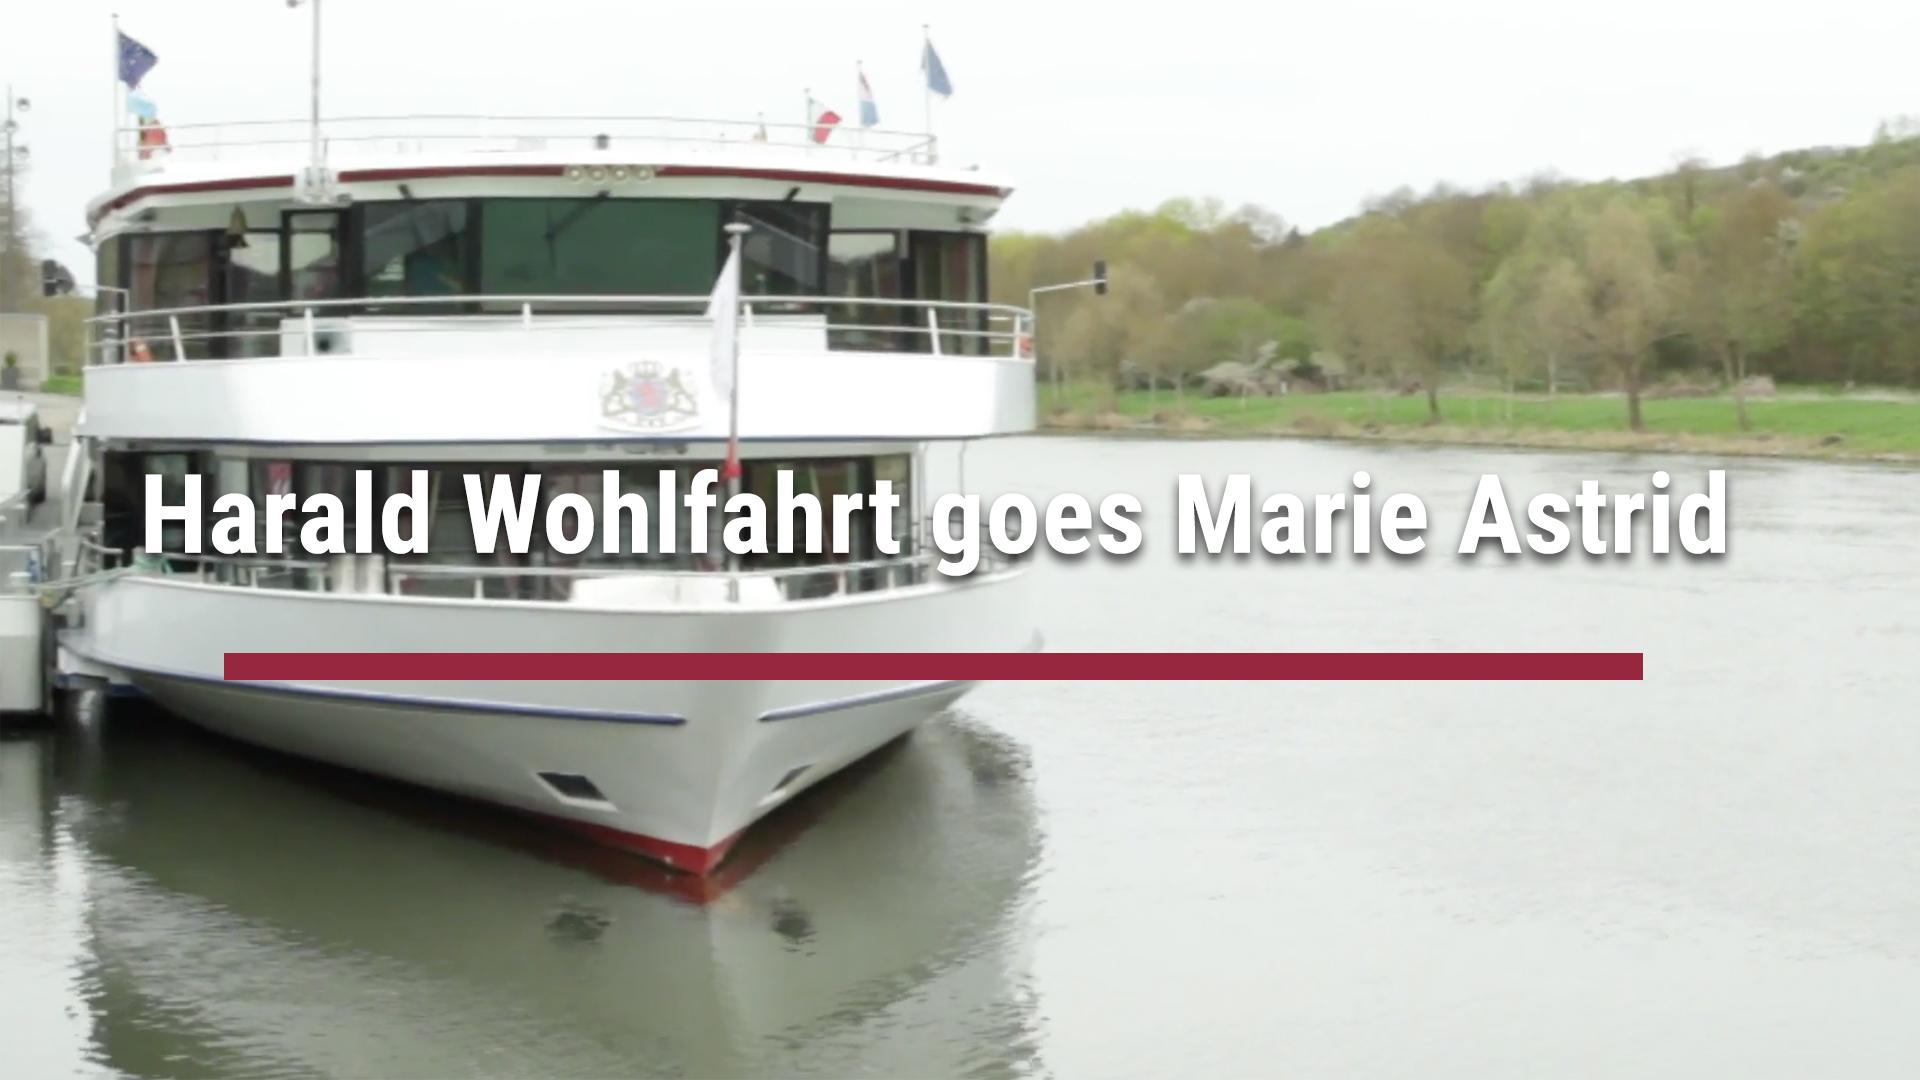 Harald Wohlfahrt goes Marie Astrid